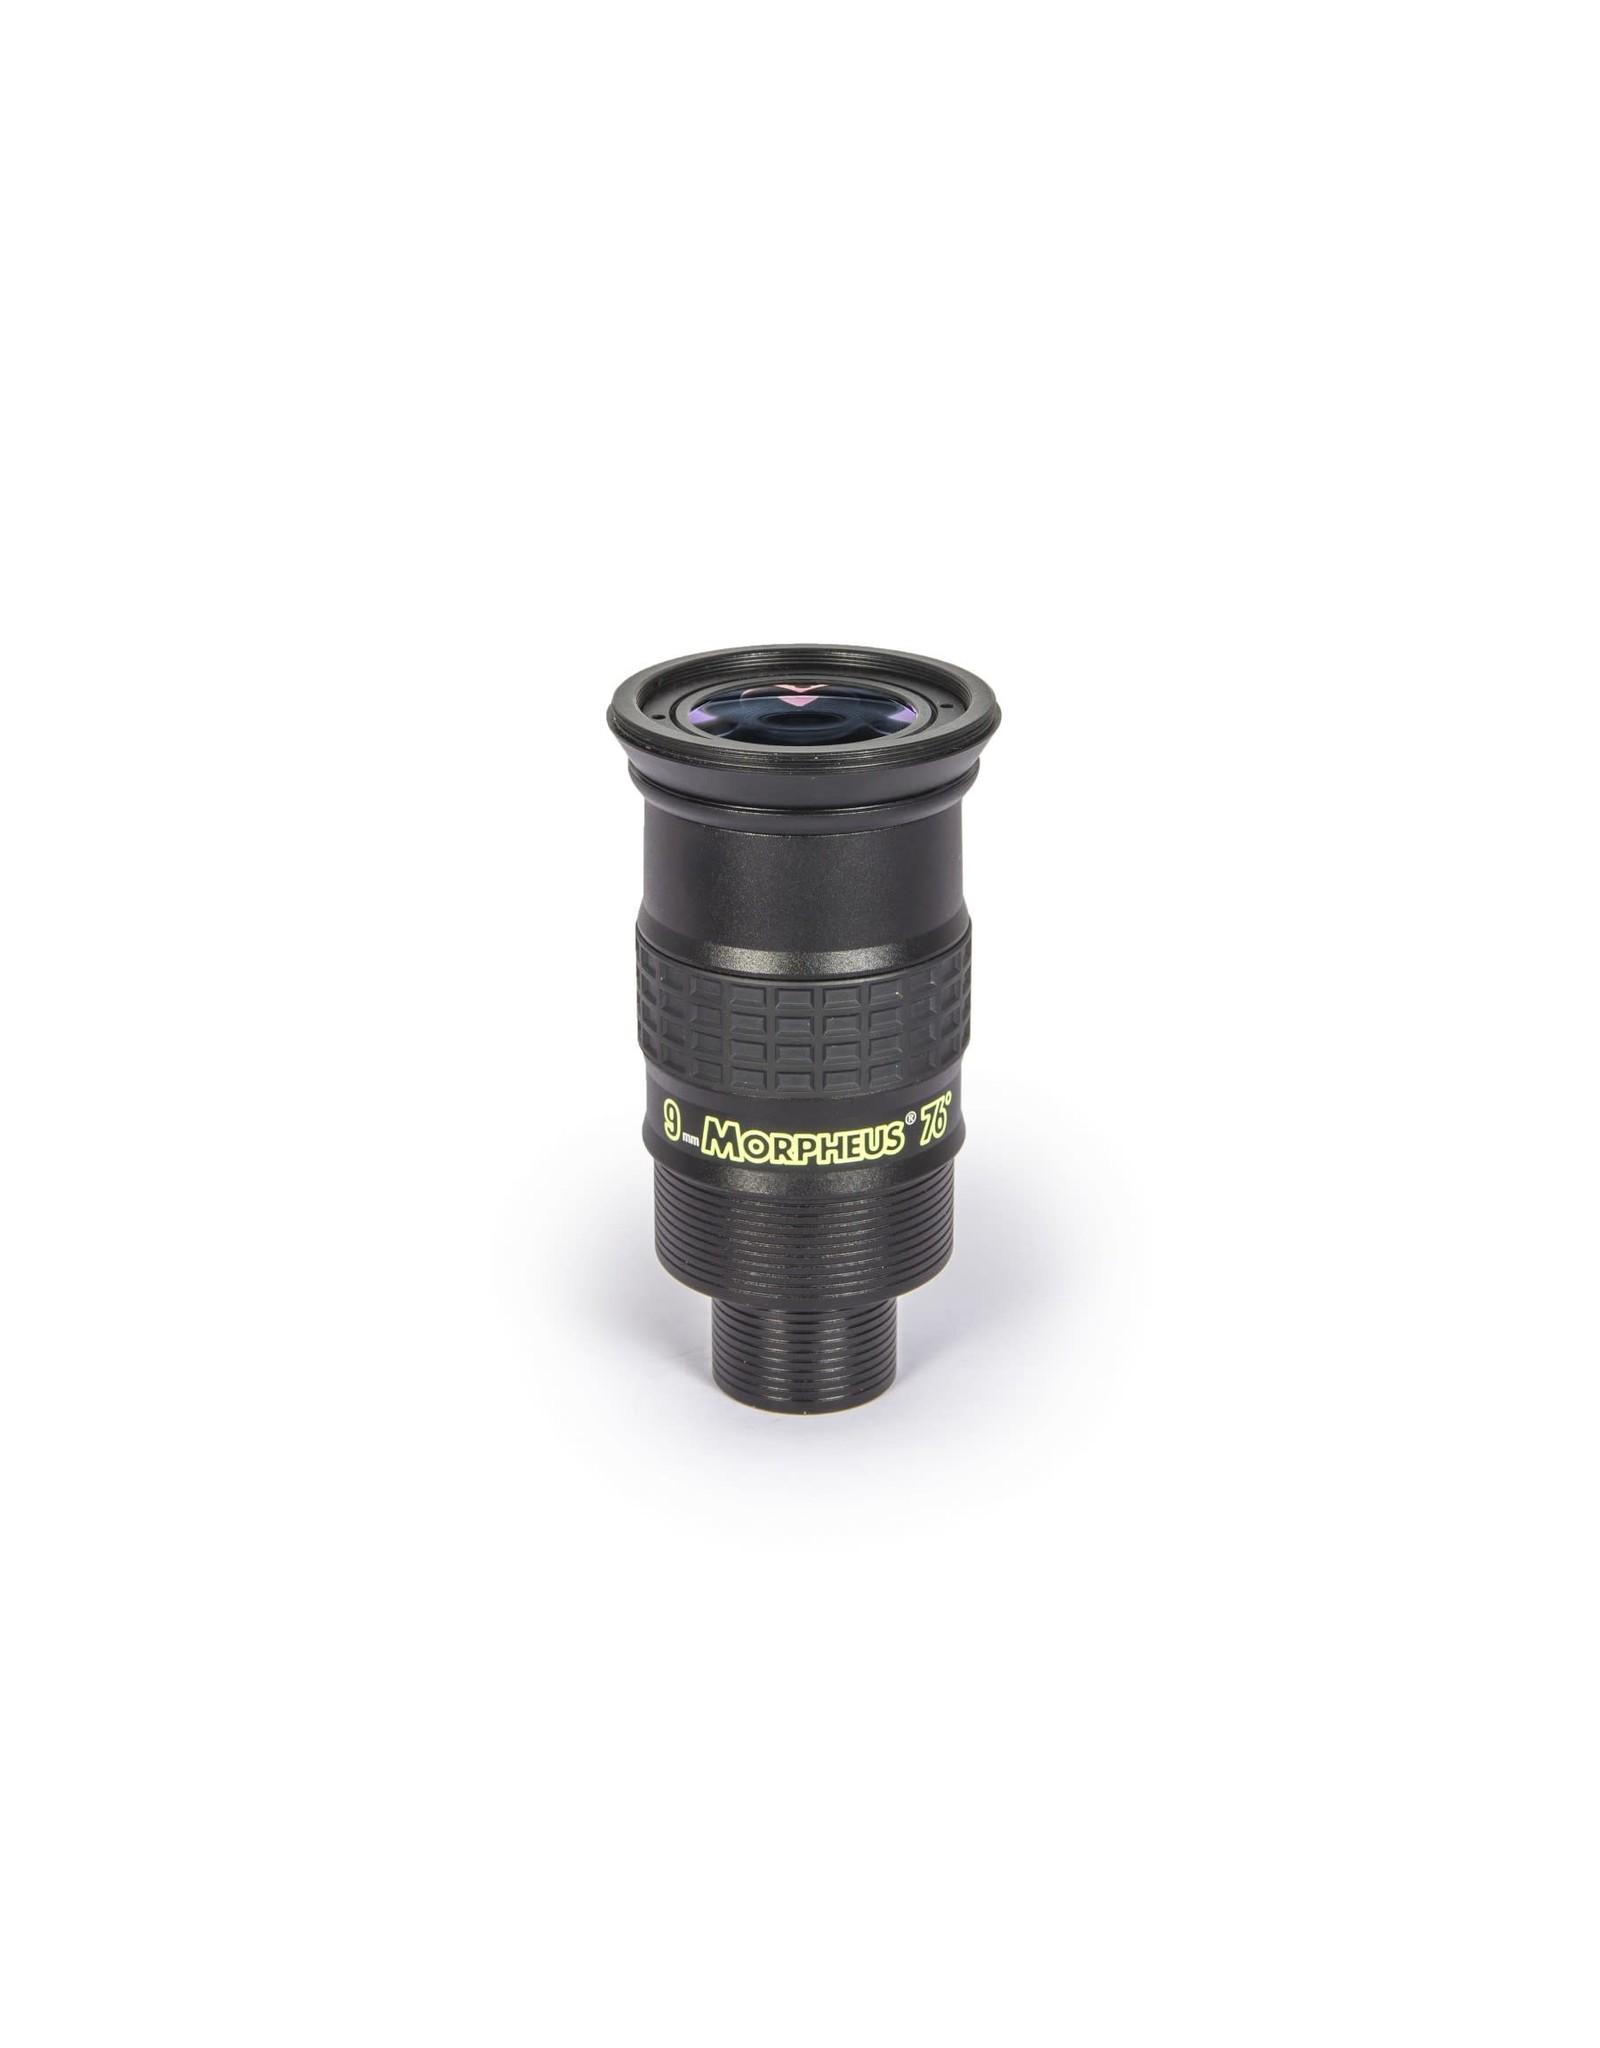 Baader Planetarium Baader Morpheus® M43 / SP54 Adapter